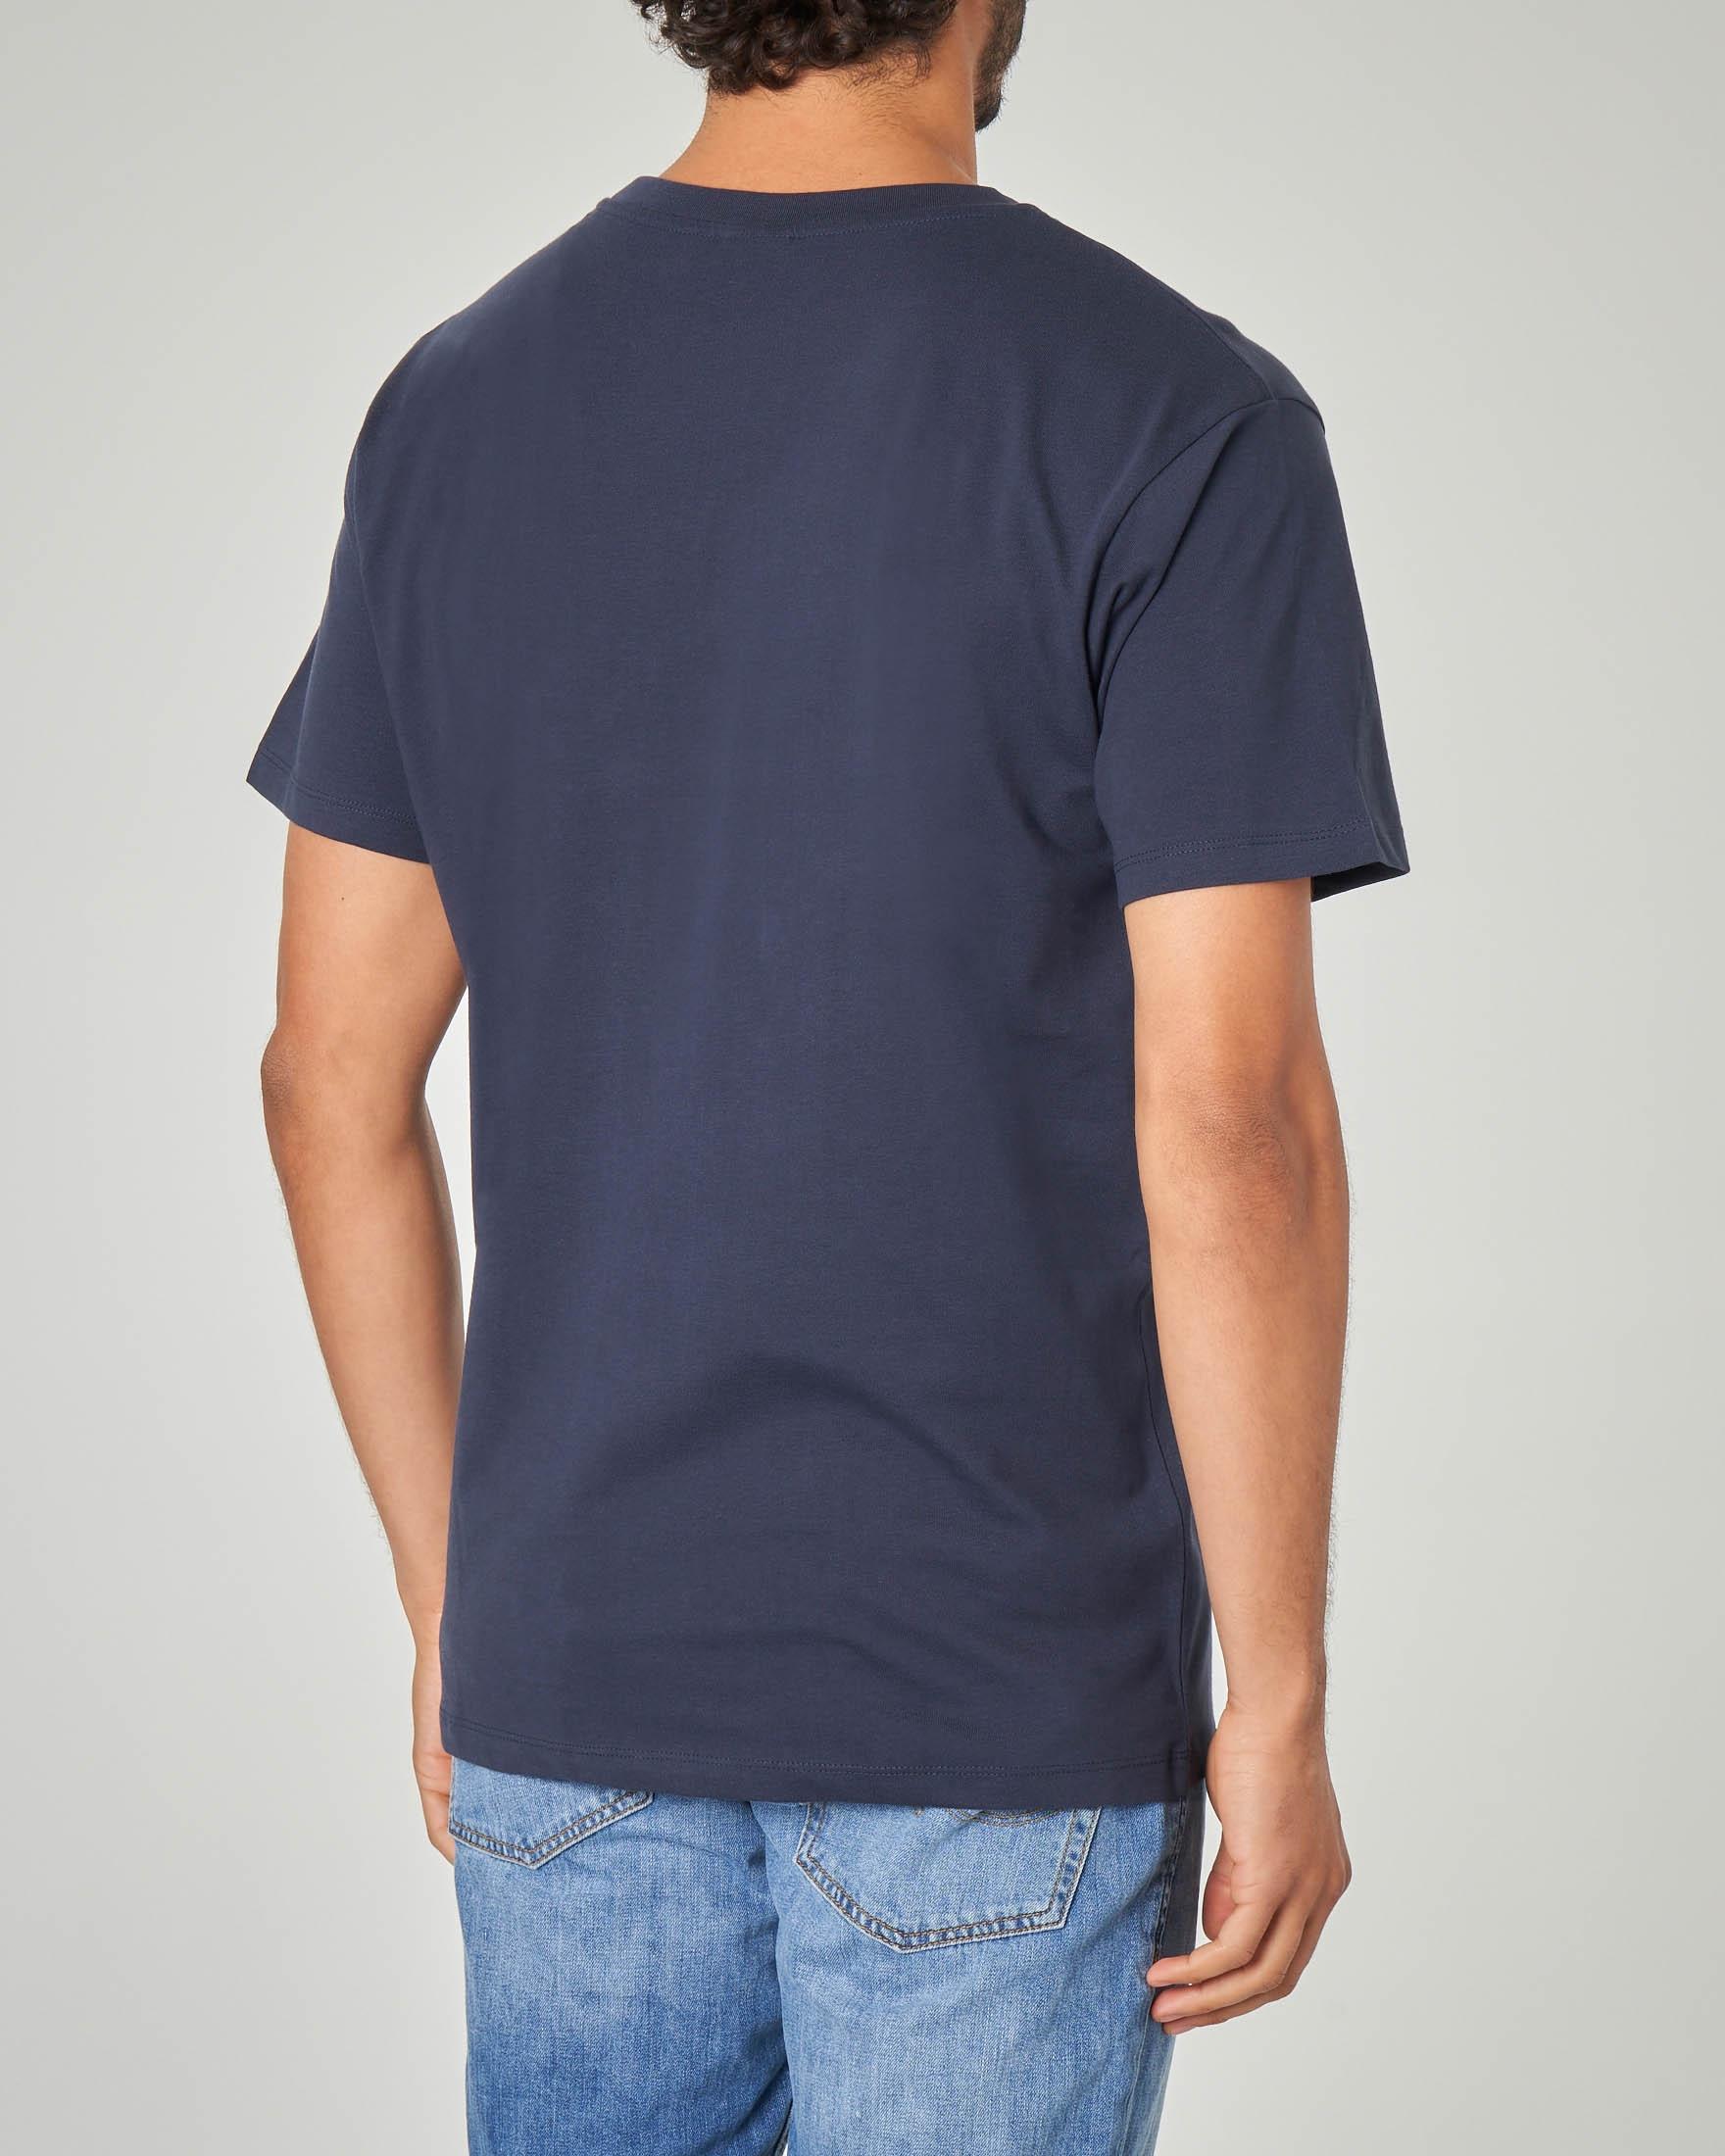 T-shirt blu con stampa football